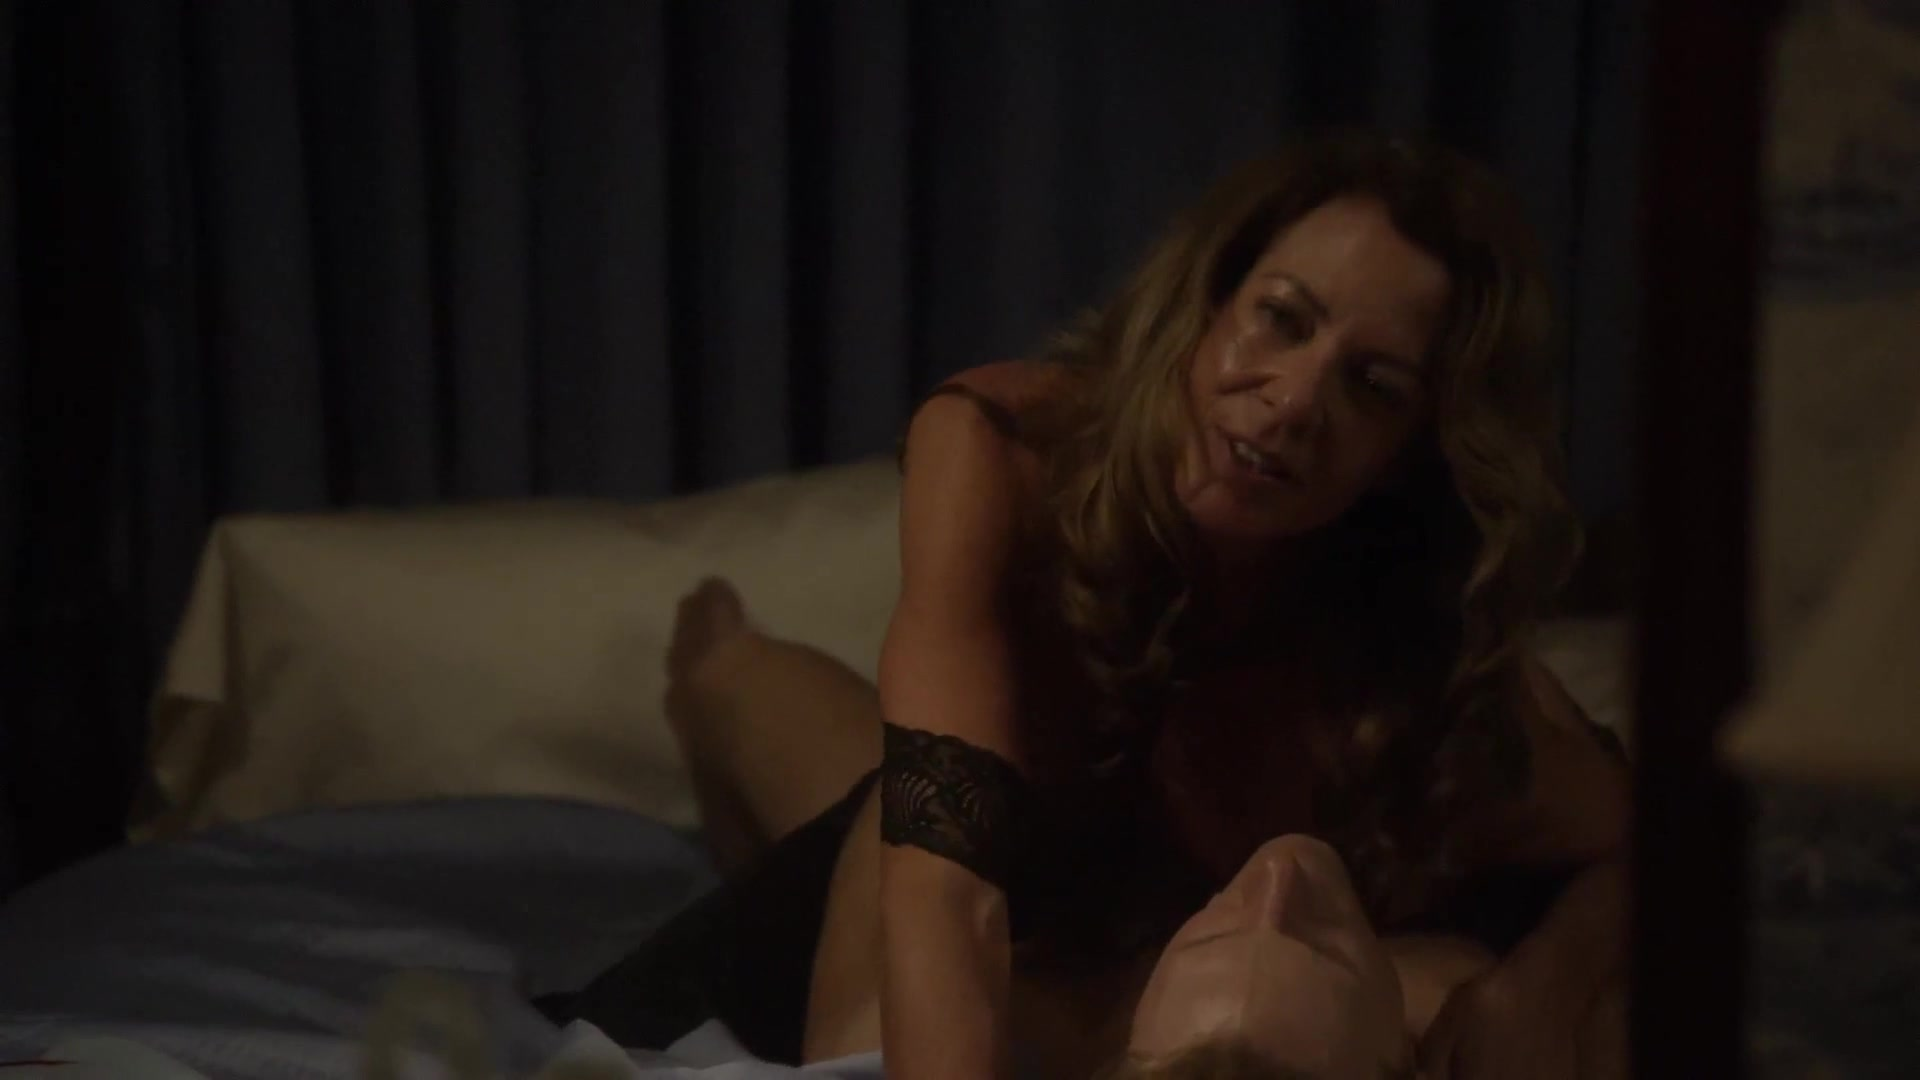 Milf stocking porn